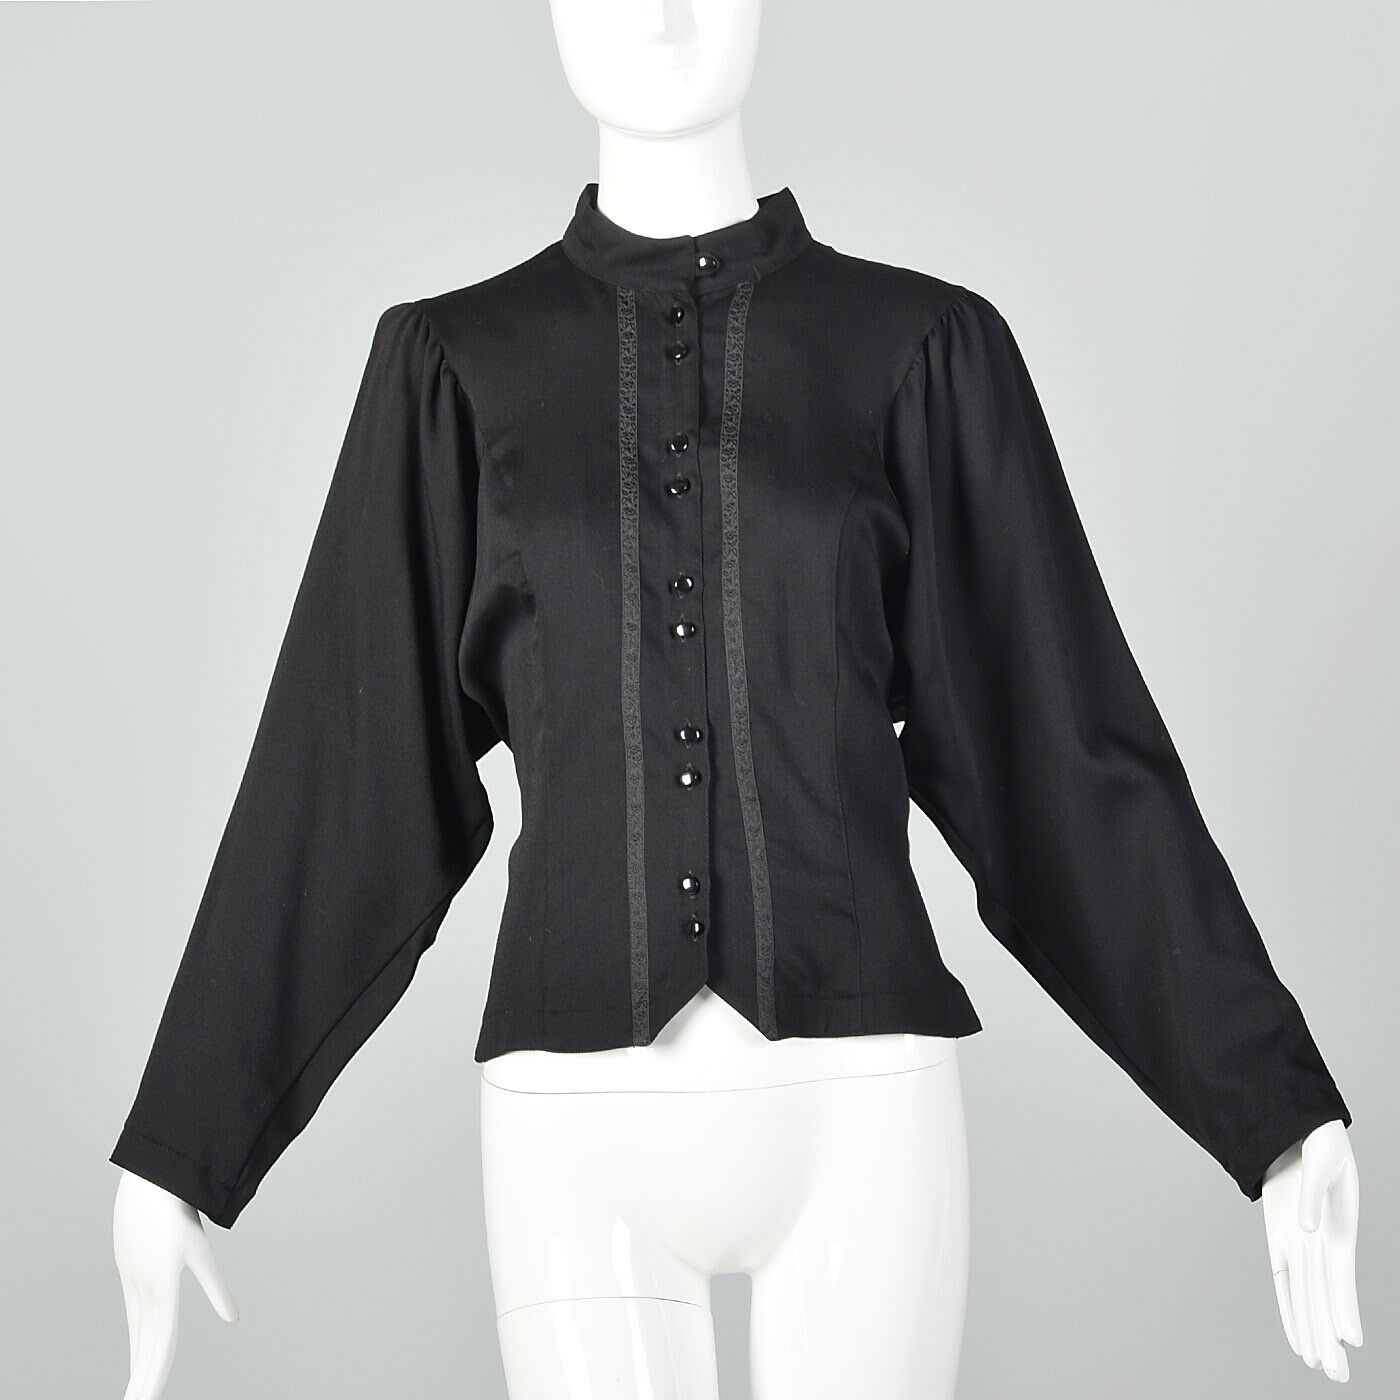 Medium schwarz Blouse Wool VTG 1980s Long Sleeve Floral Trim Gothic Shirt